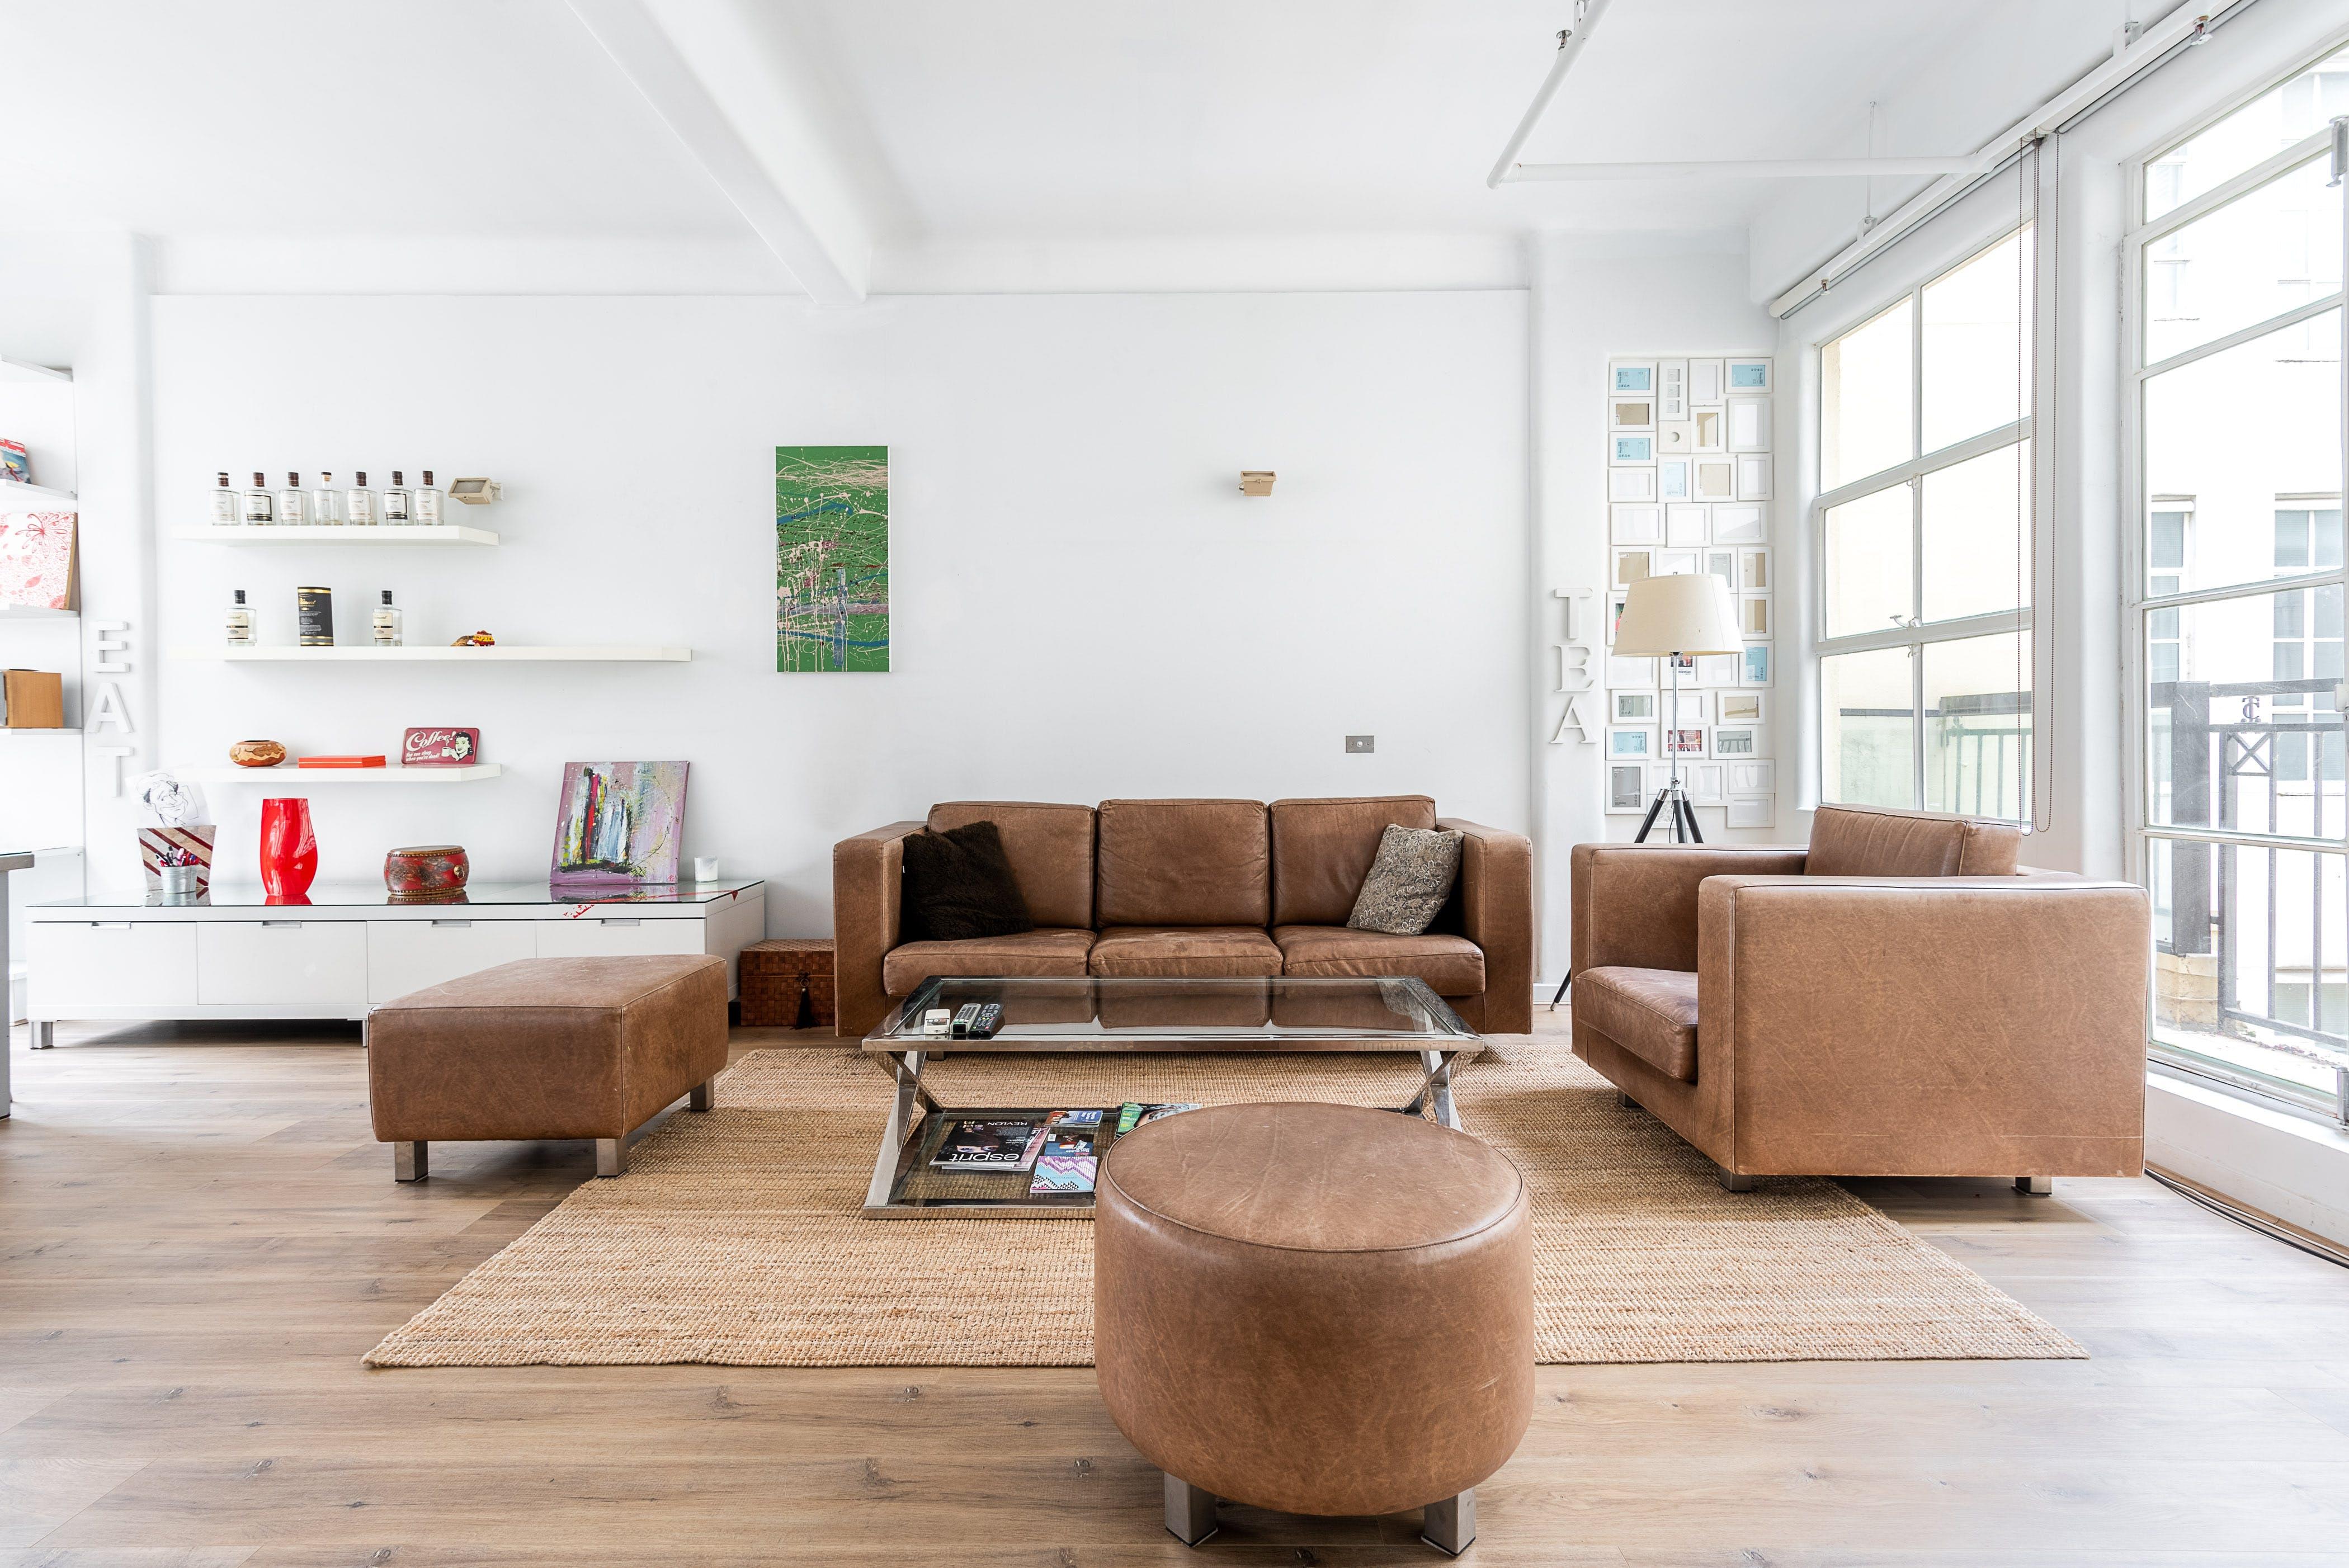 Le Salon, multi-use area at Le Petit Loft, image 1